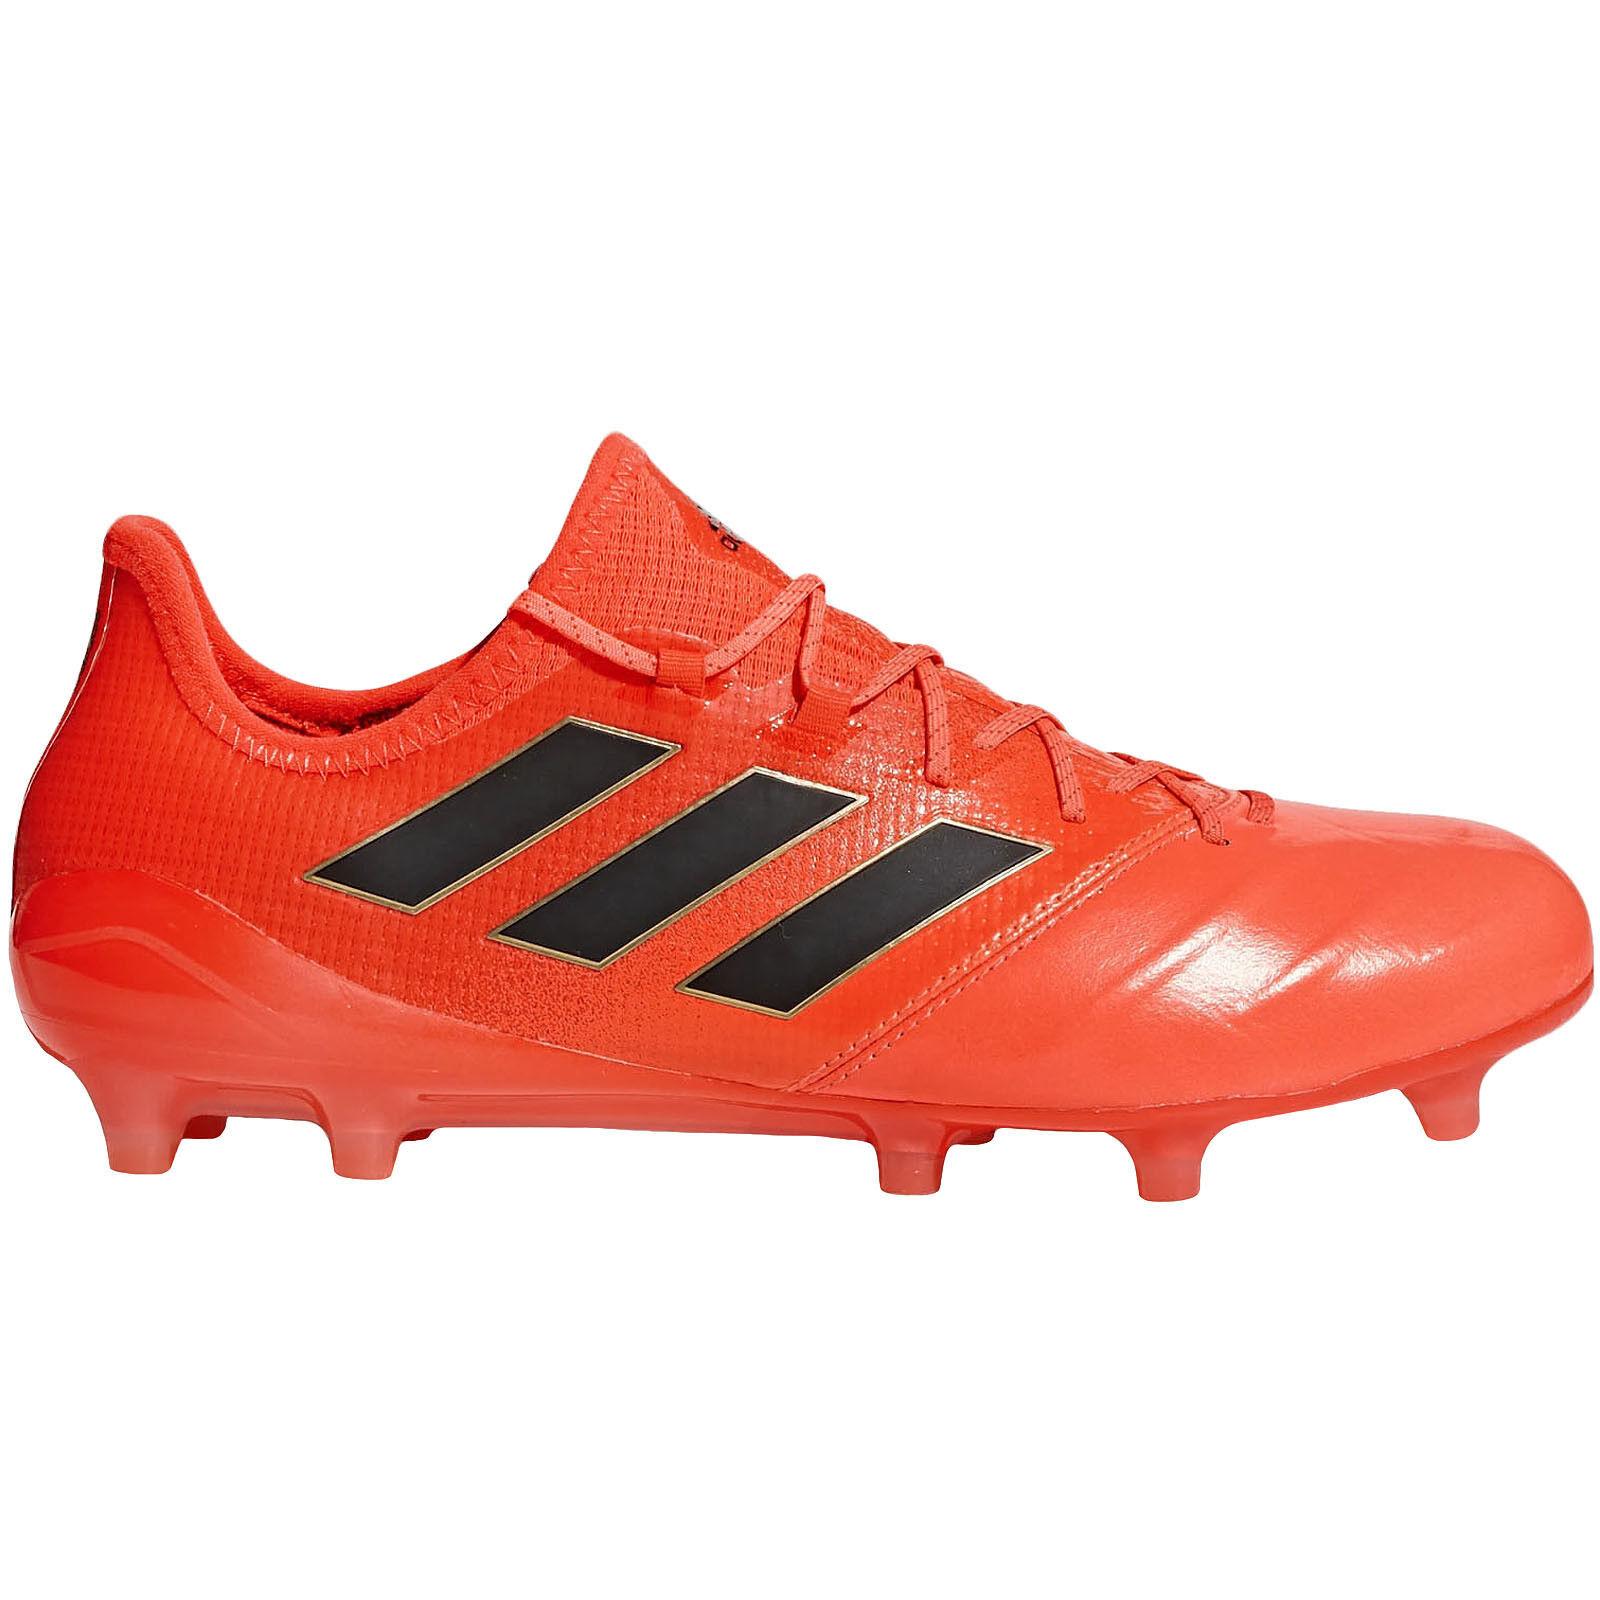 Adidas Perforhommece hommes Ace 17.1 pelle Firm chaussures da Calcio - Arancione